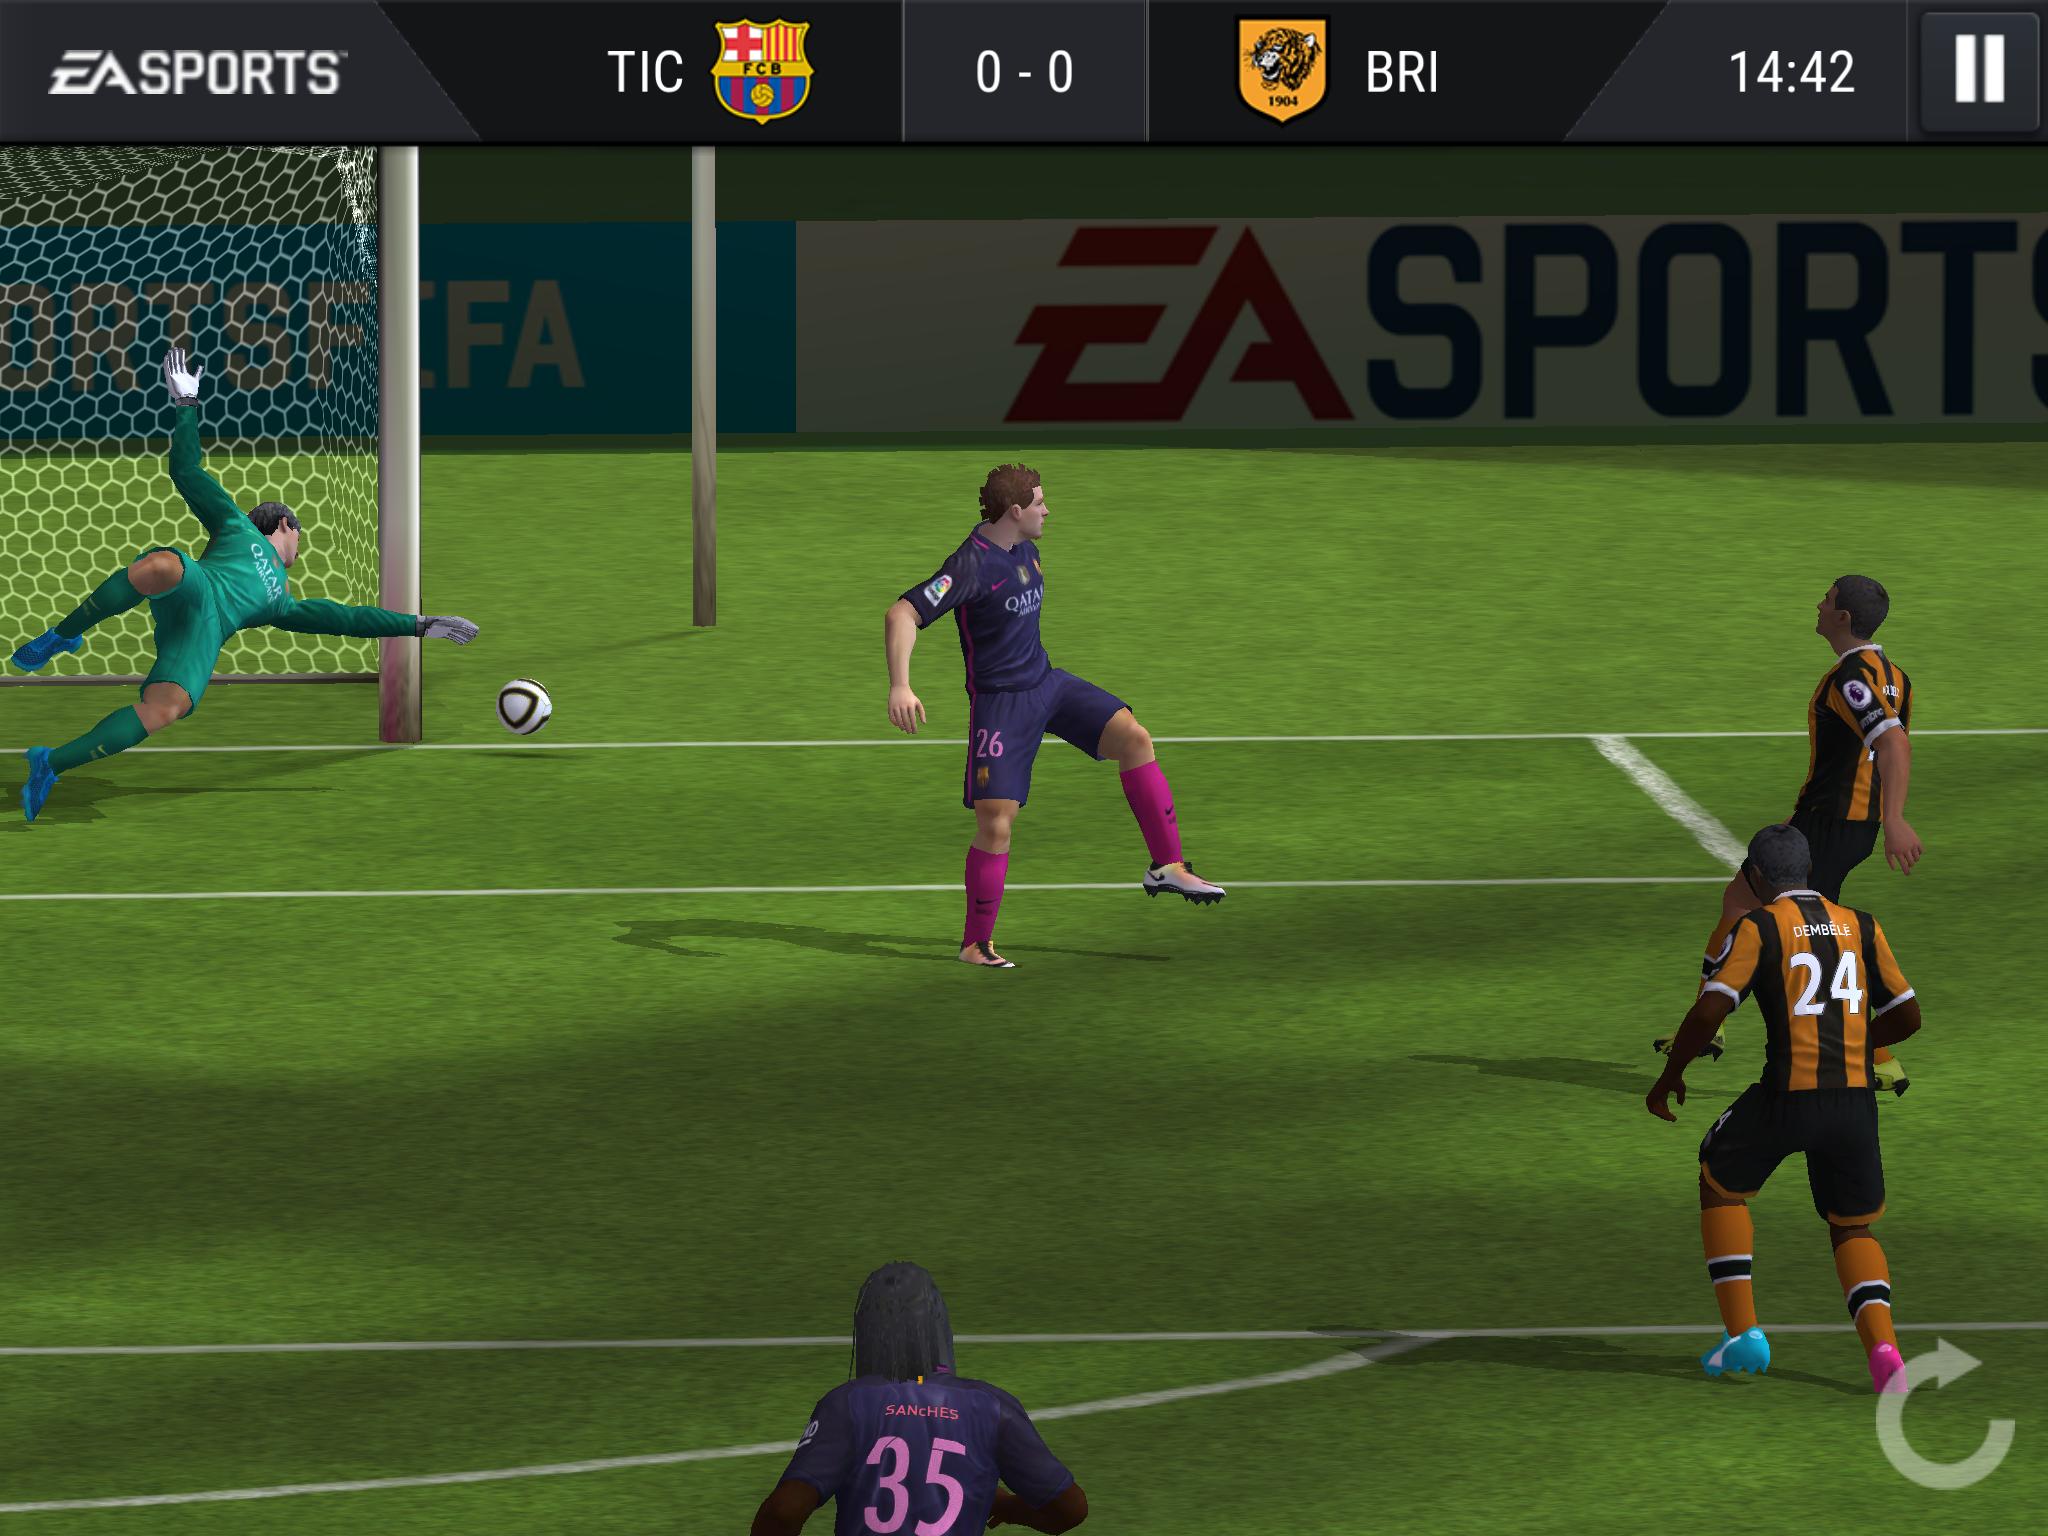 FIFA Mobile: General gameplay tips | Articles | Pocket Gamer